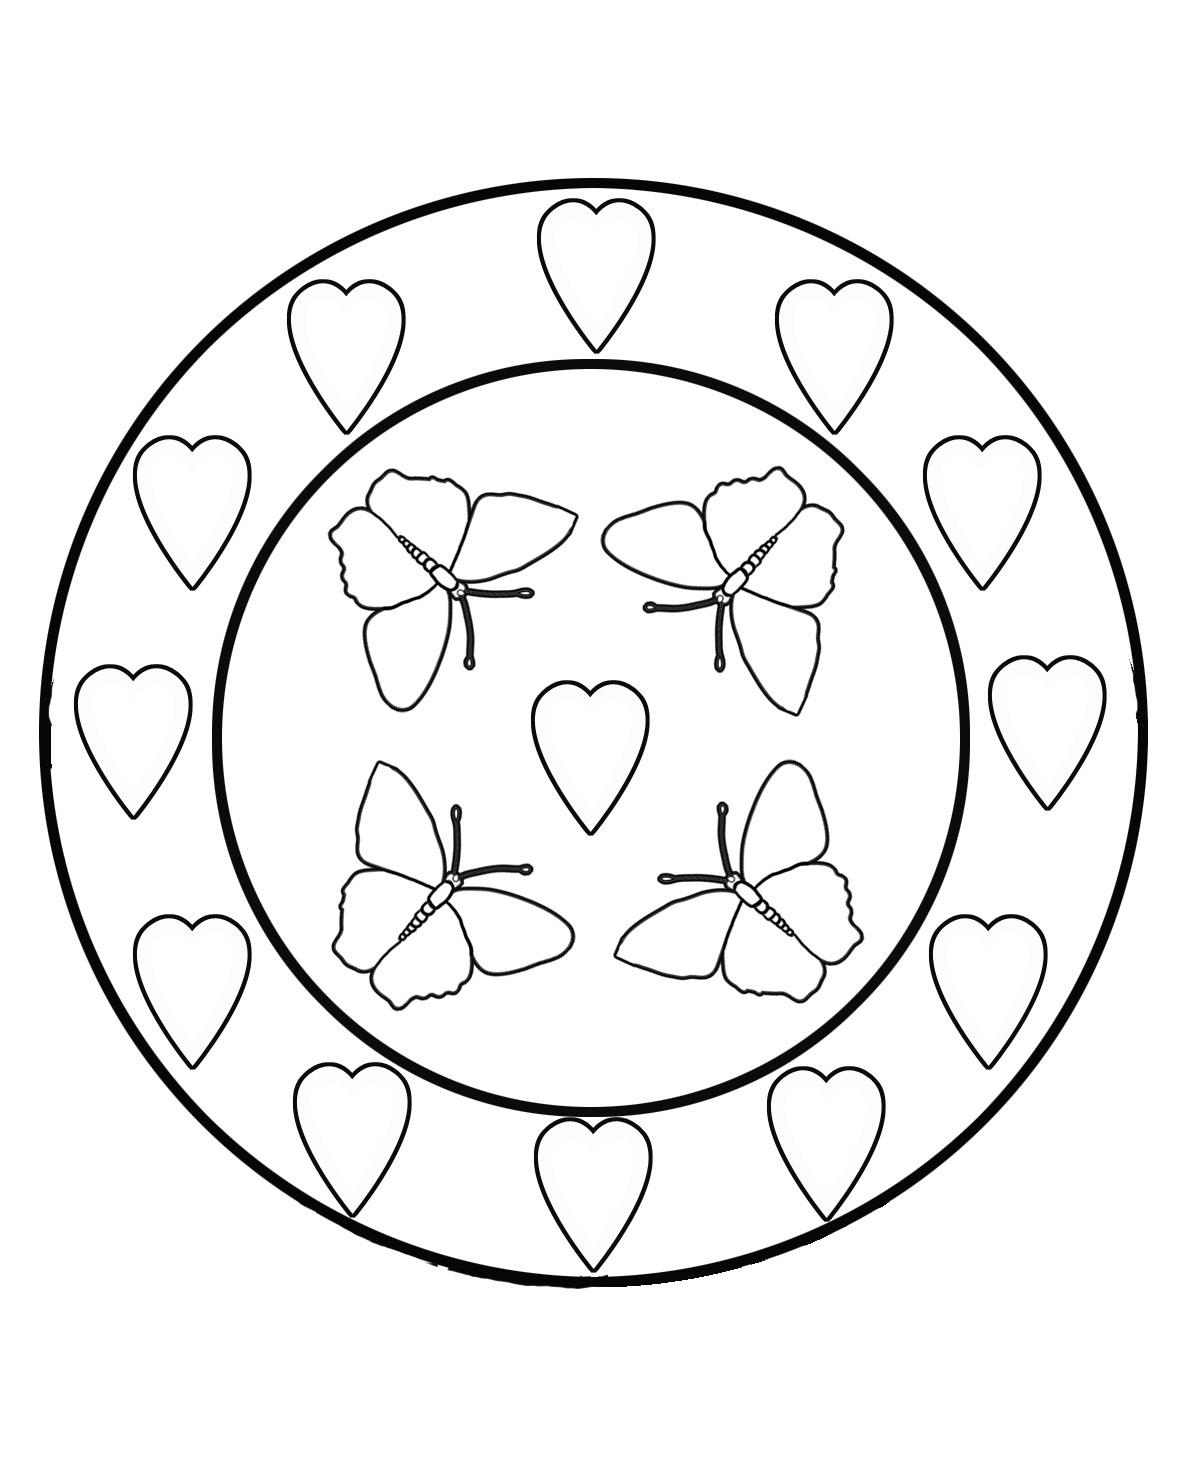 Queen Hearts Coloring Sheet